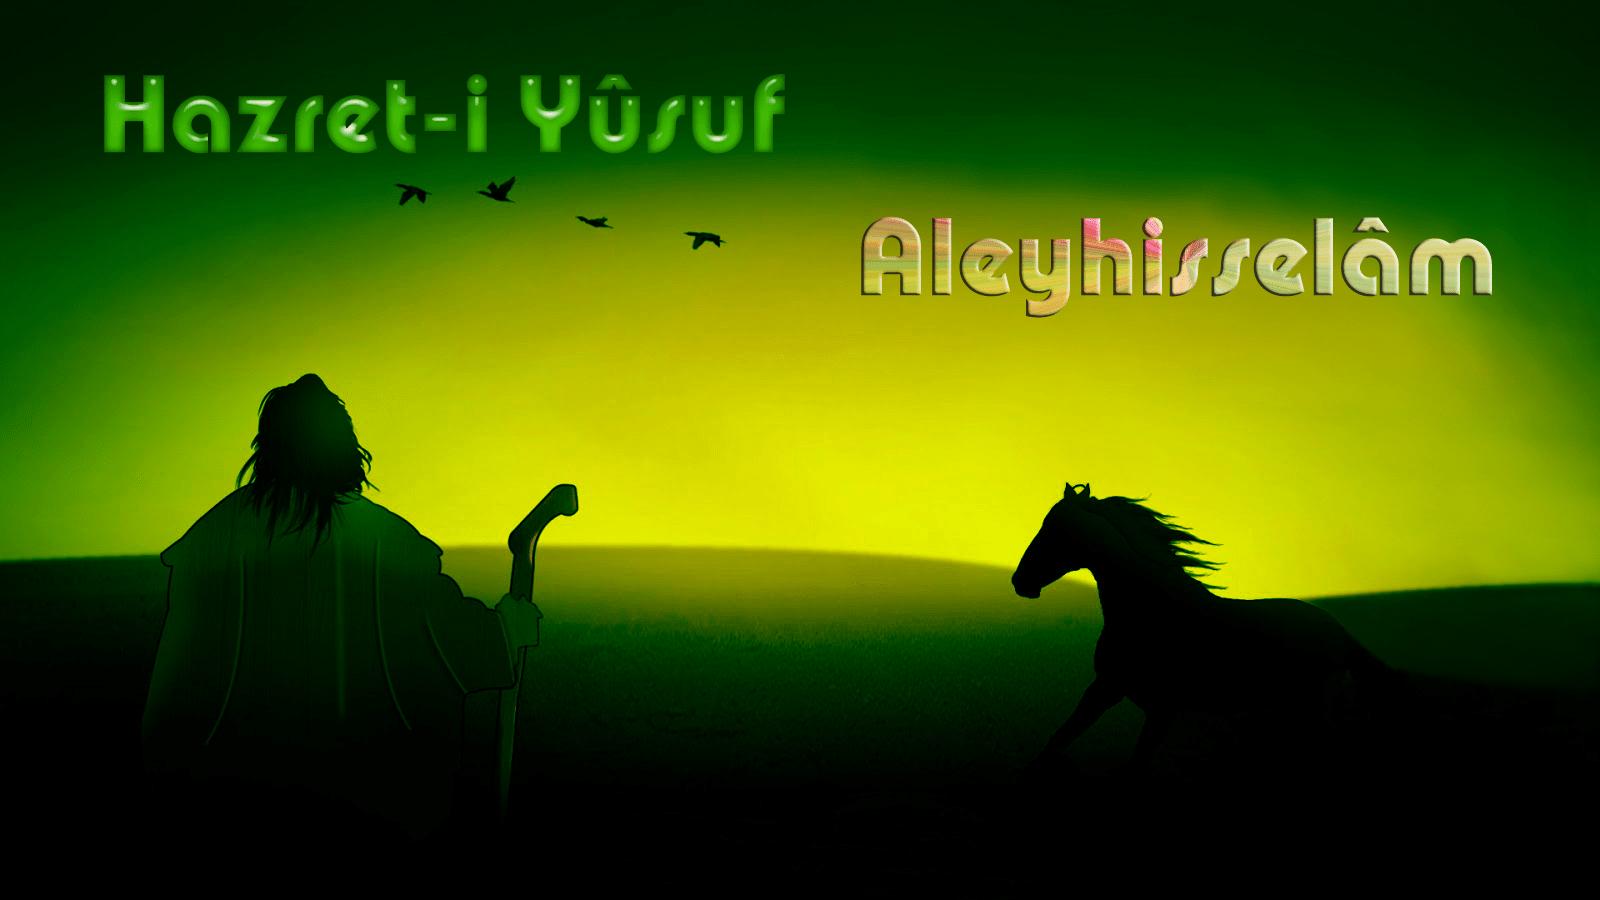 Hazreti-Yusuf-Aleyhisselam Hazreti-Yusuf-Aleyhisselam